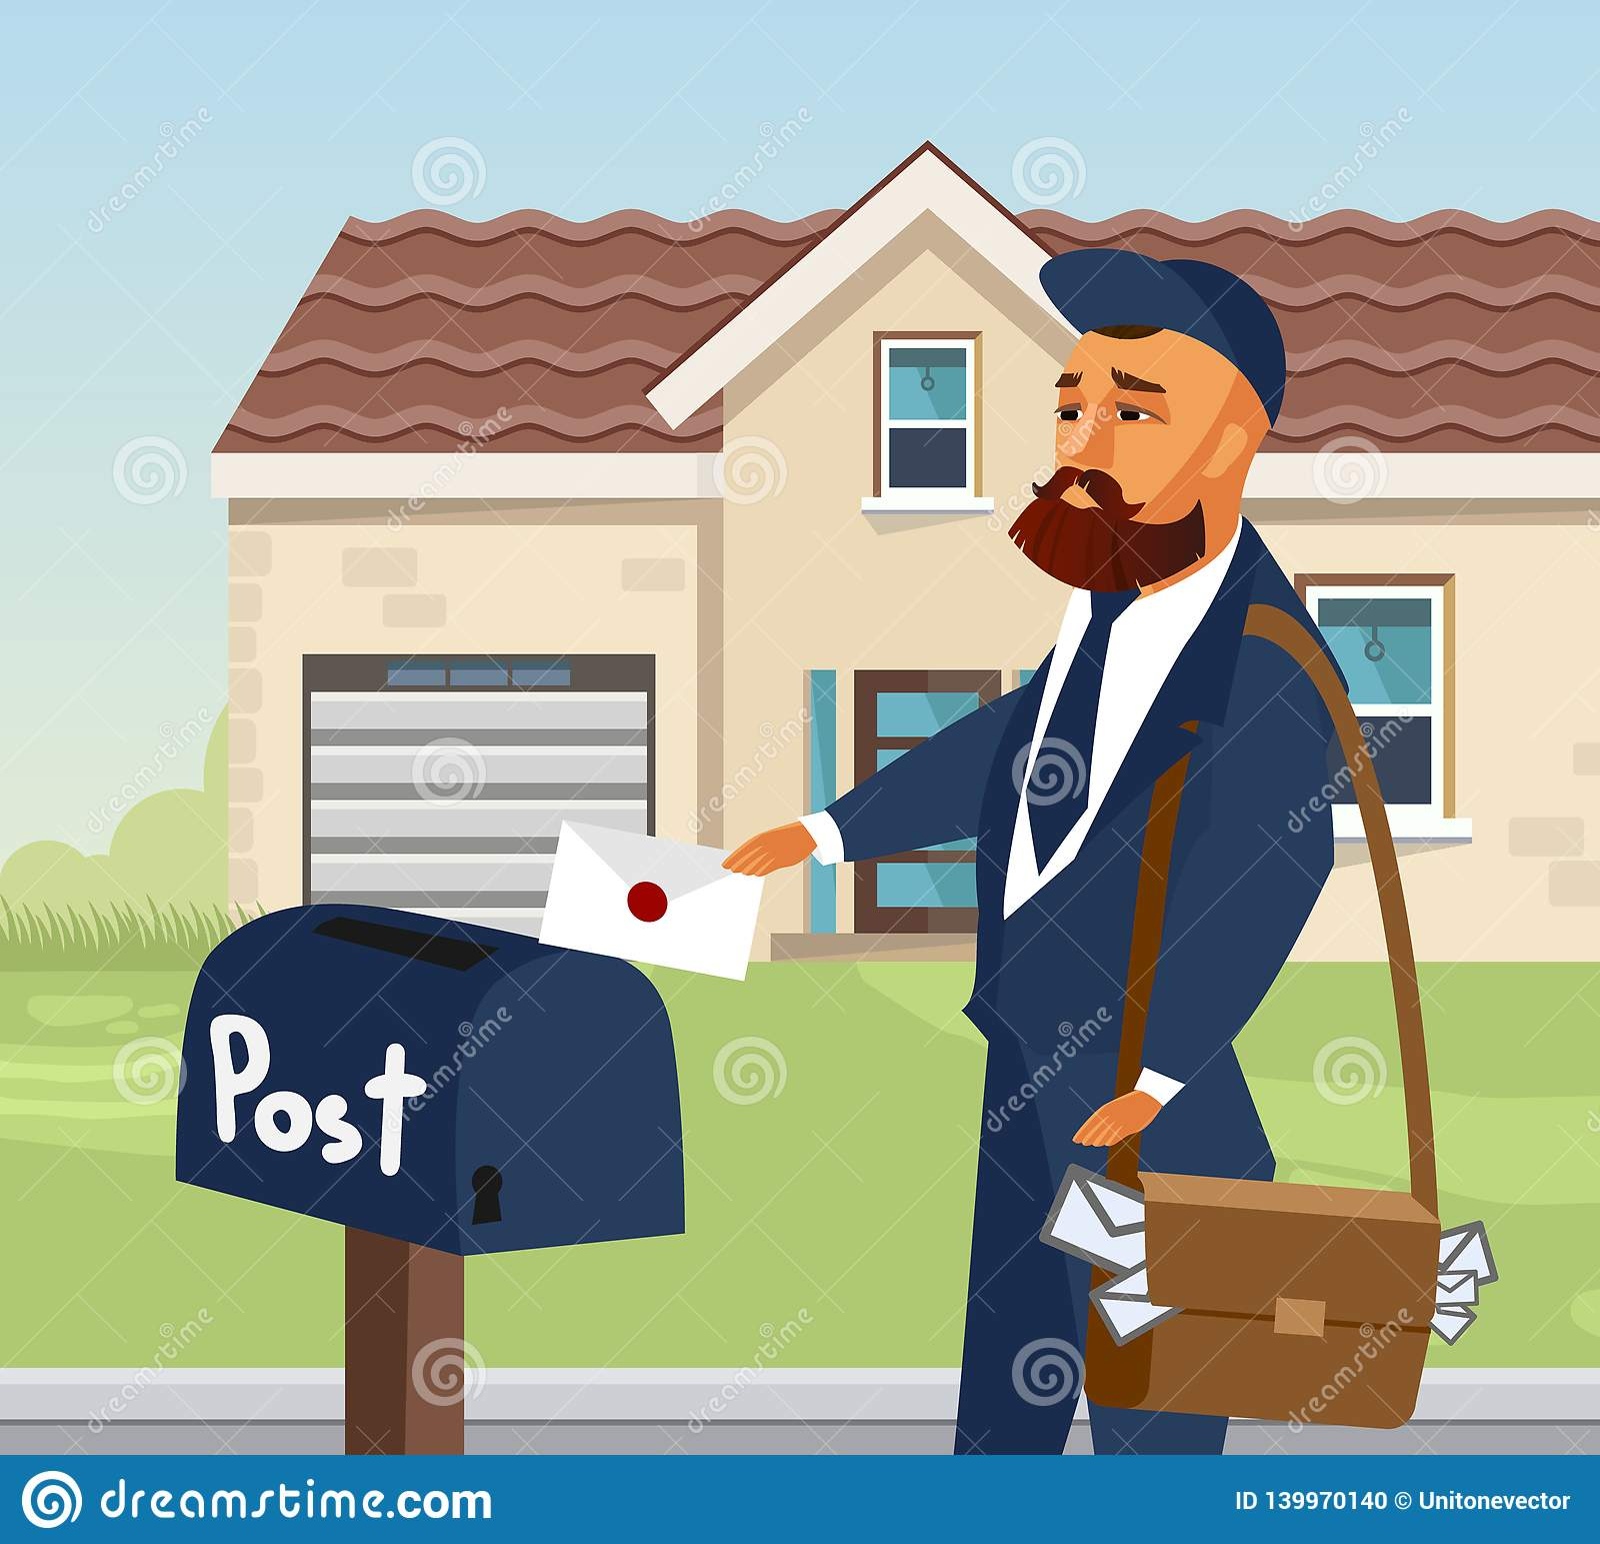 Postman in Professional Uniform Design Element